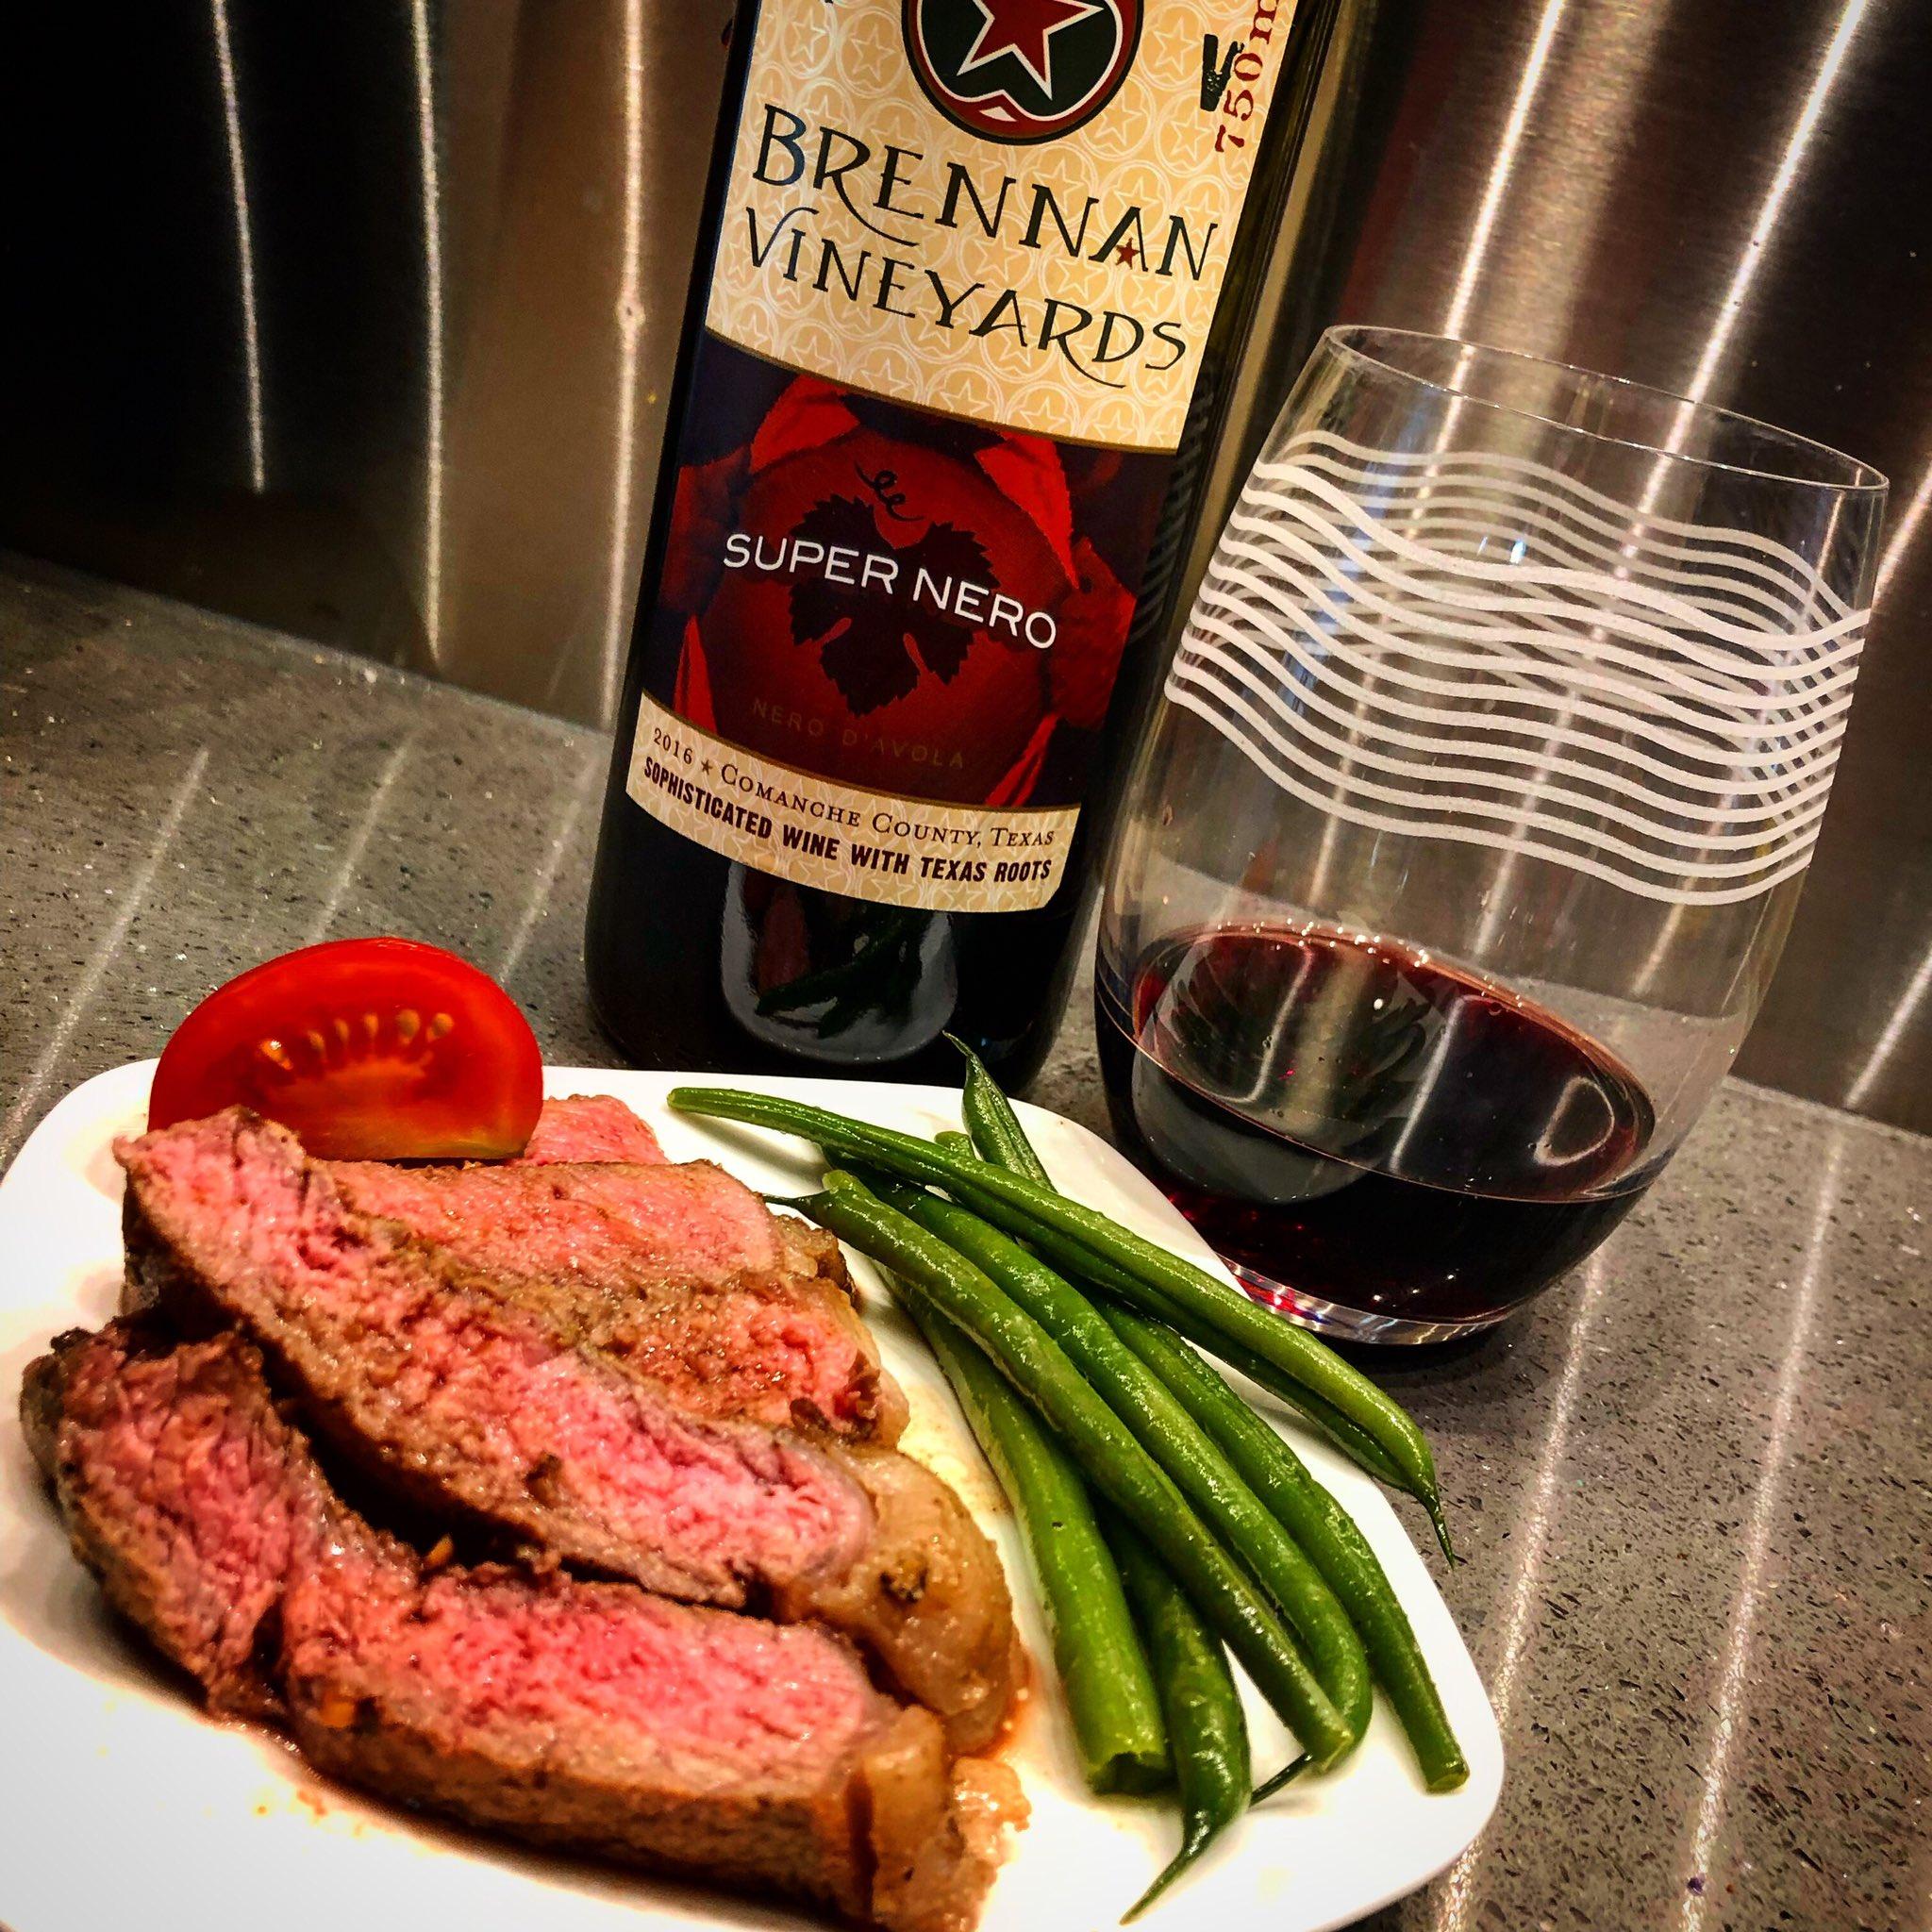 It's petite steak night with vino rojo grande @BrennanVineyard #SuperNero #nerodavola blend #Txwine #Delightful #steaknight https://t.co/l4bLVnymMH